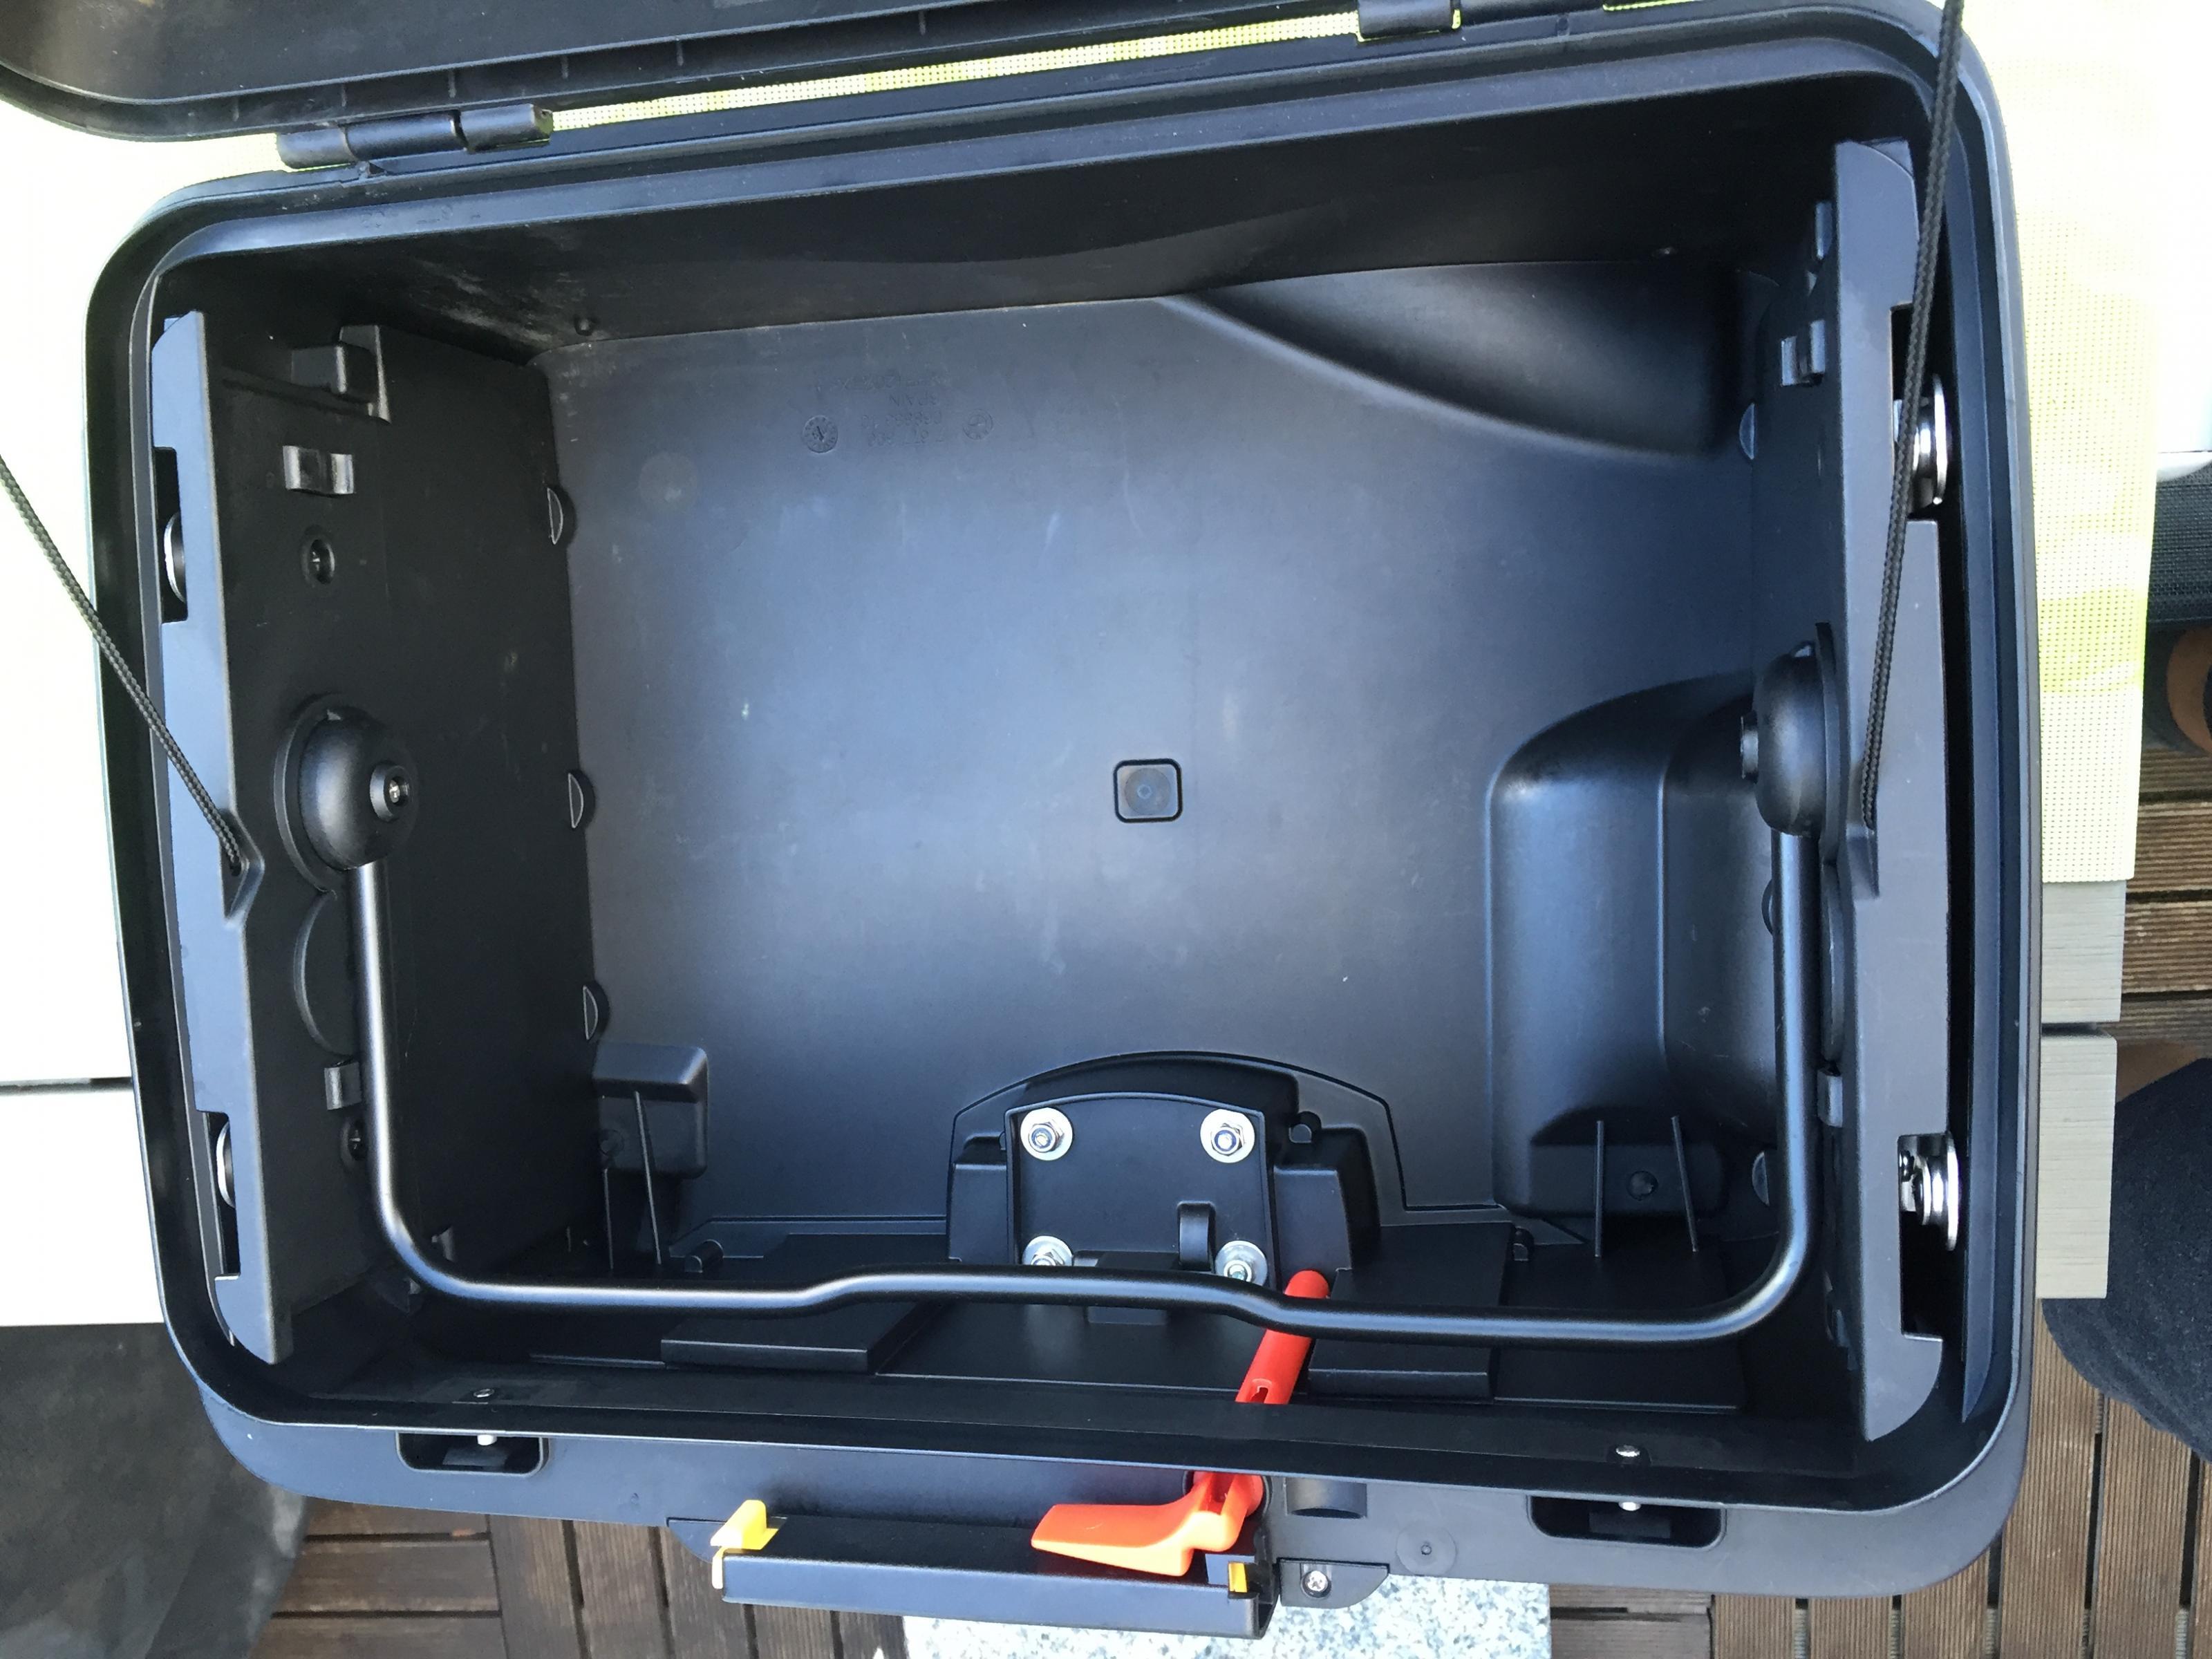 biete r 1200 gs adventure bmw 1200 gs k25 vario koffer. Black Bedroom Furniture Sets. Home Design Ideas